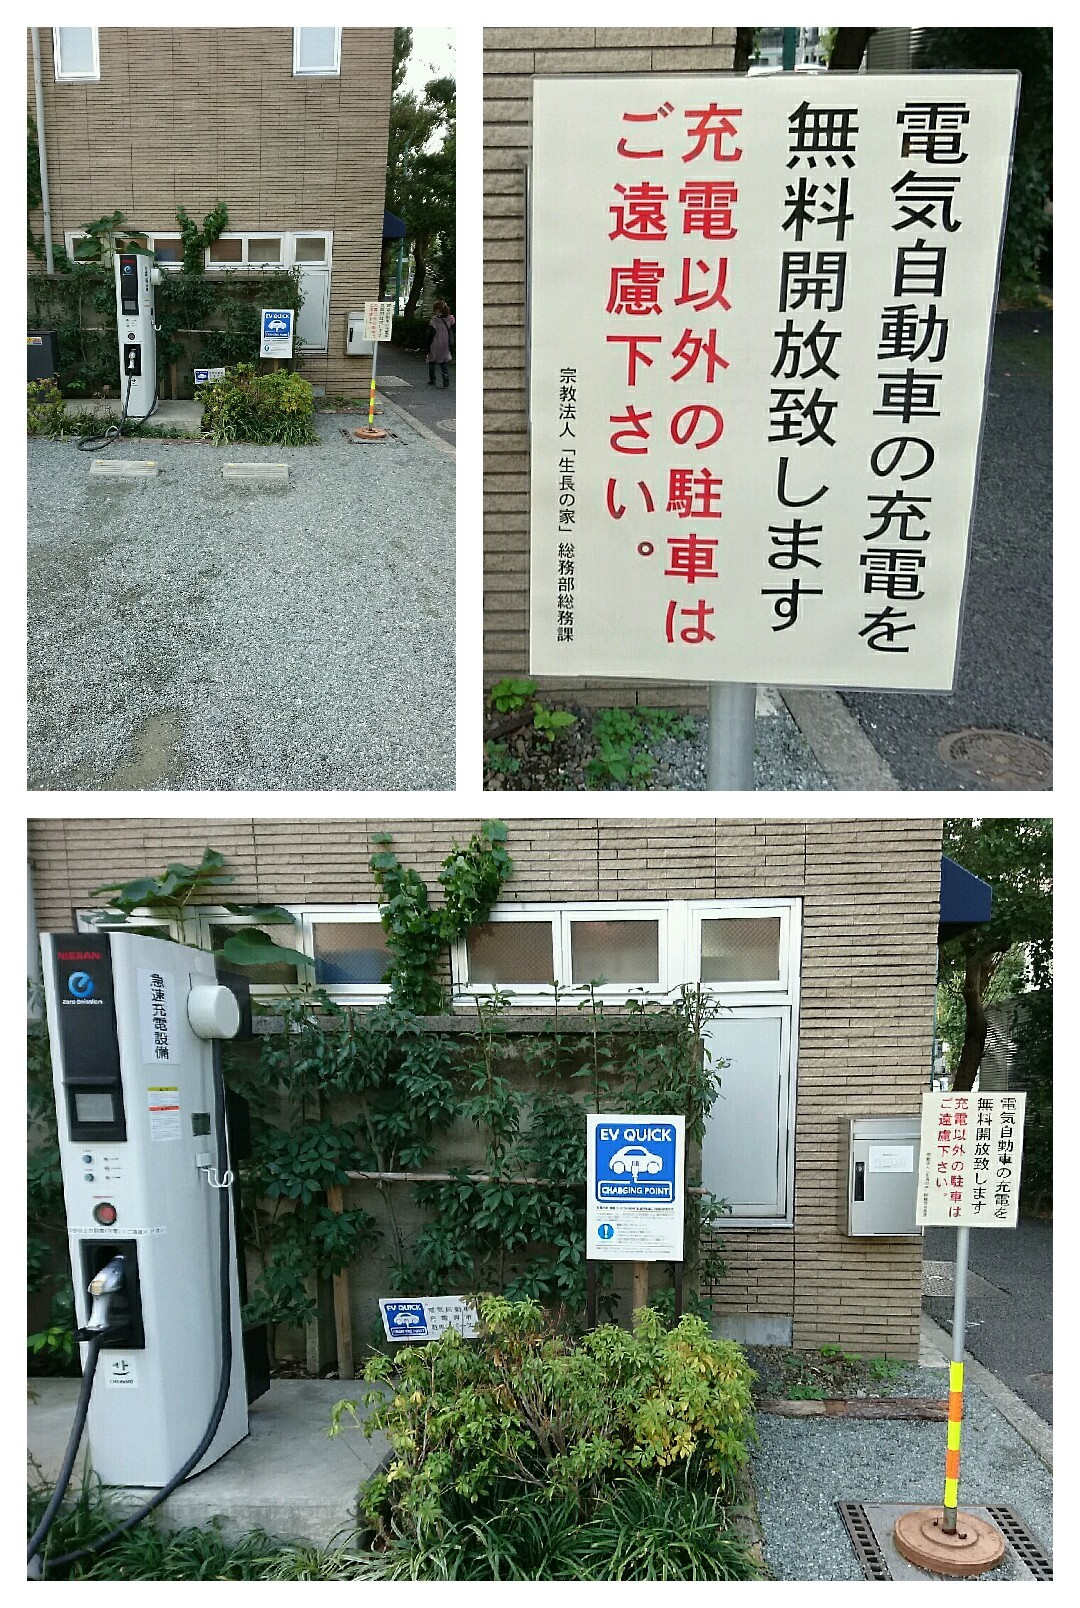 EV.PHEV充電スポット情報 東京 「生長の家 原宿」